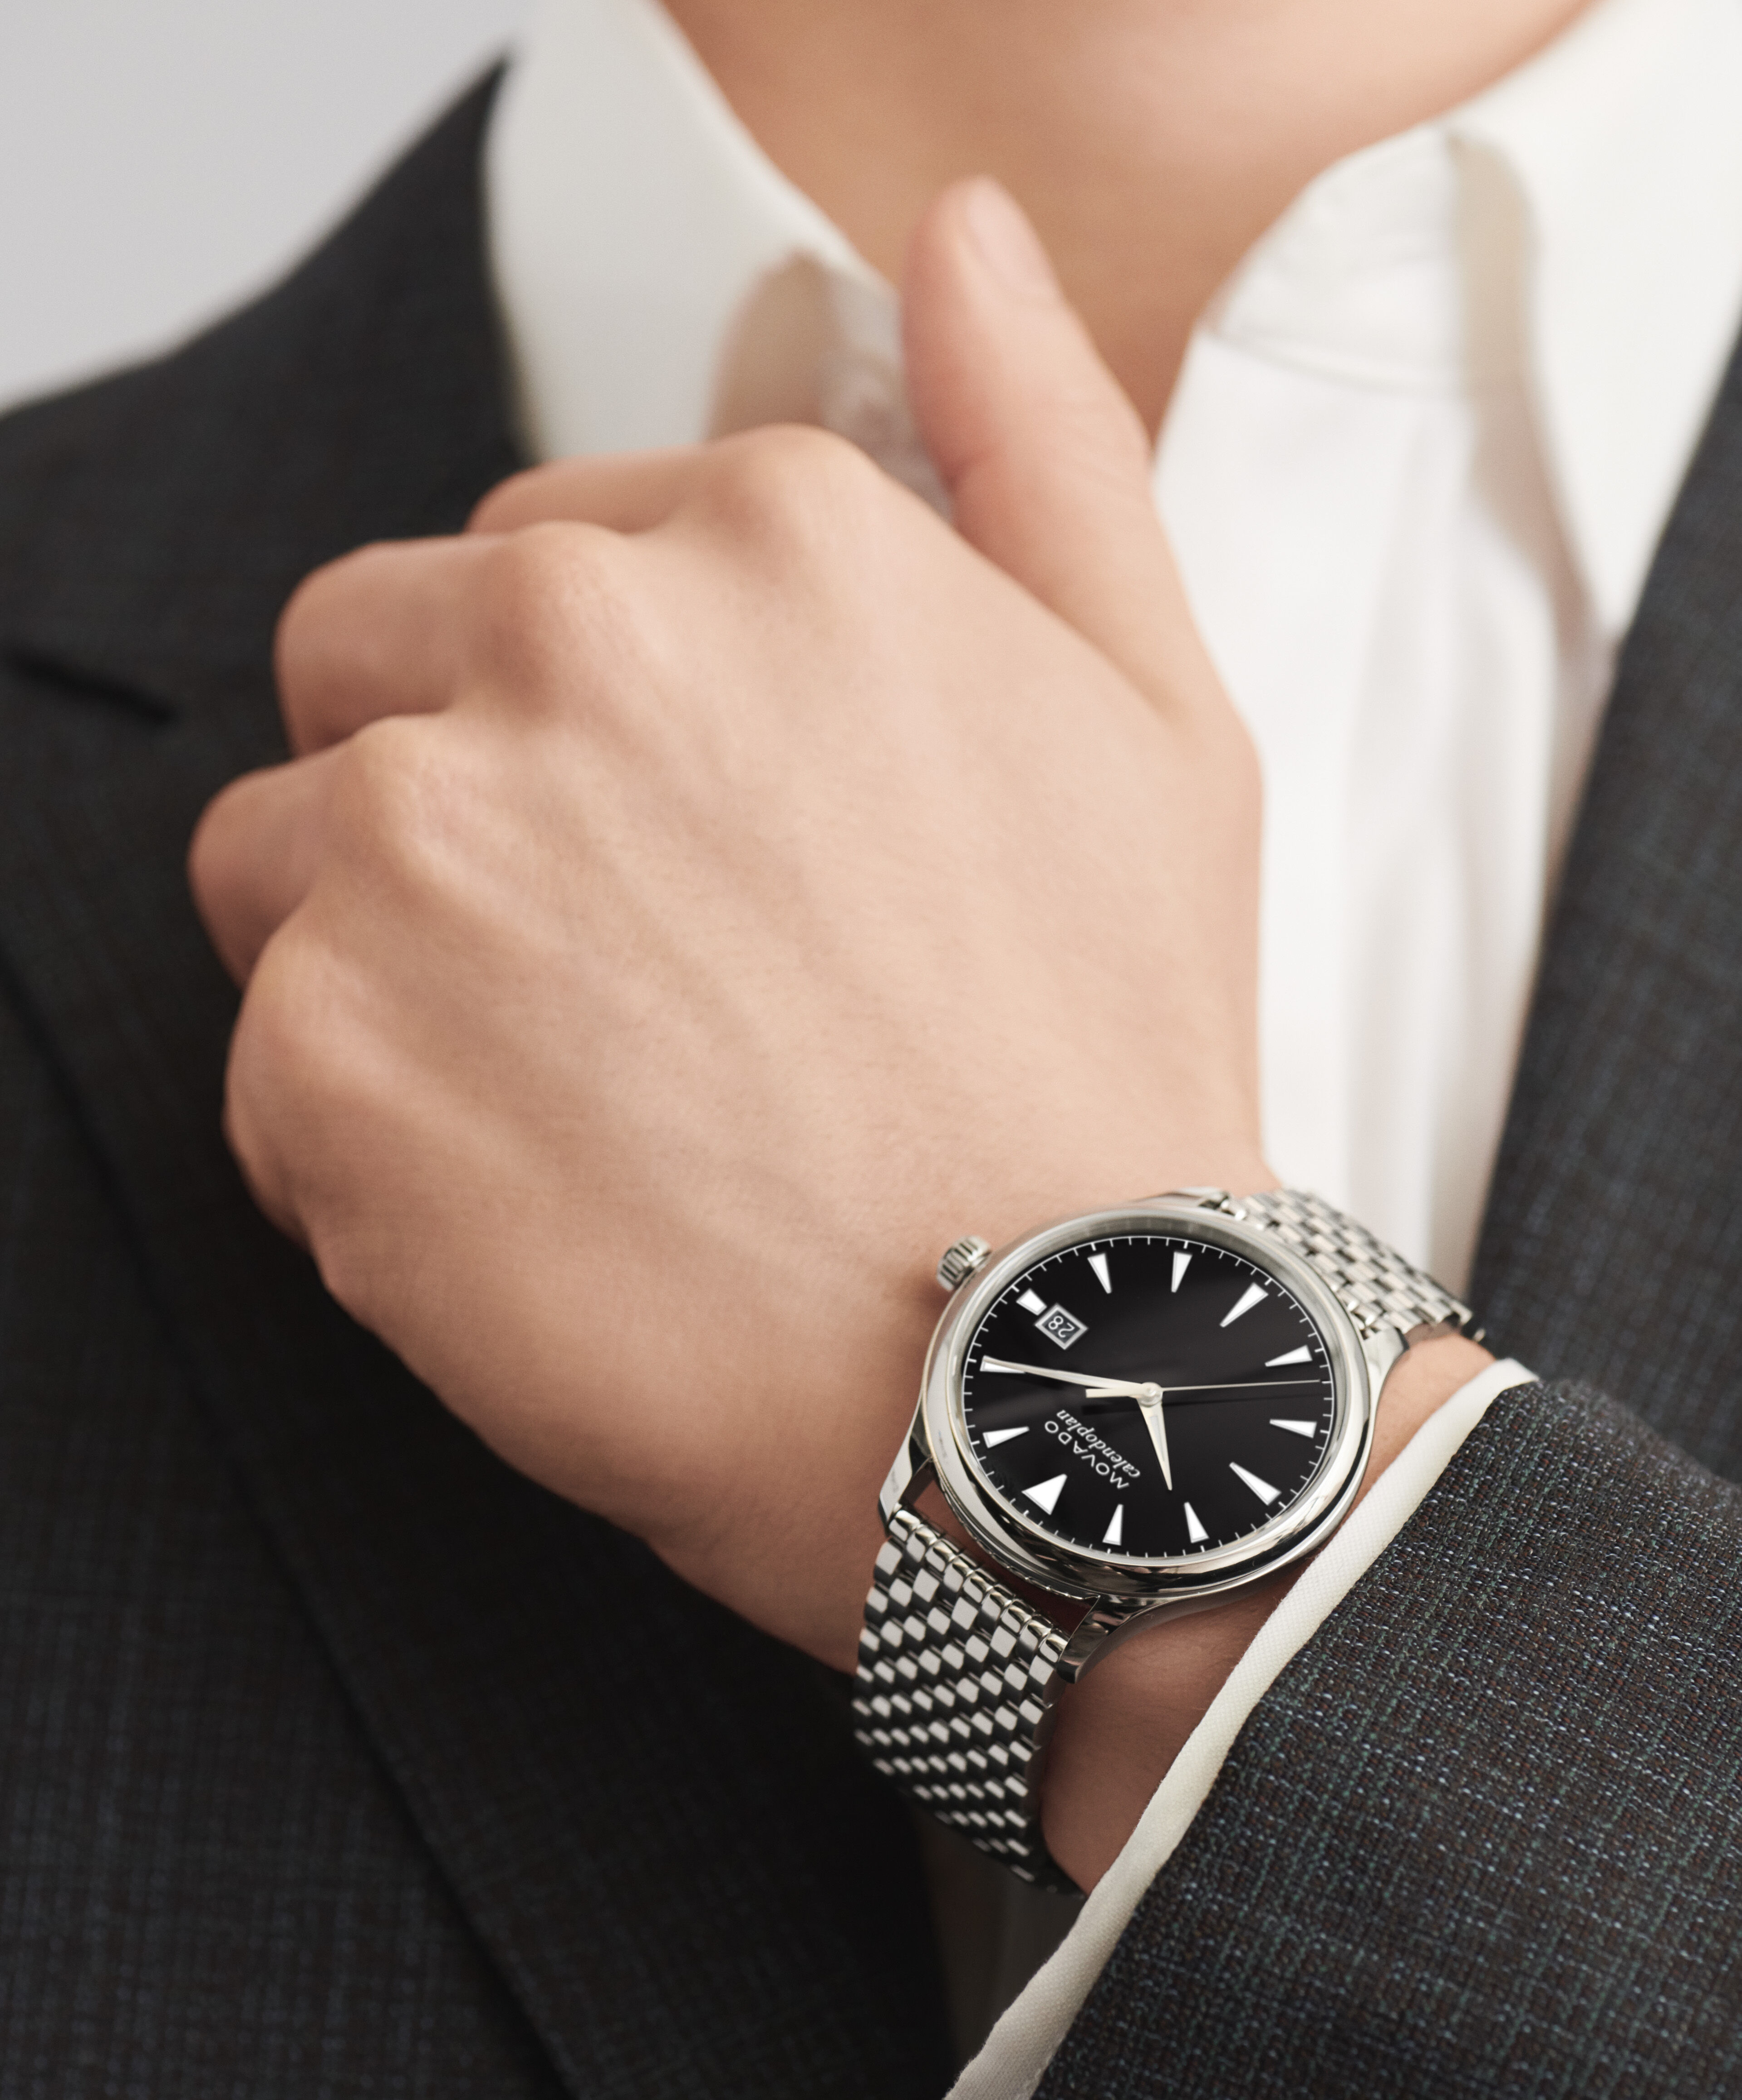 Branded Watch Copy